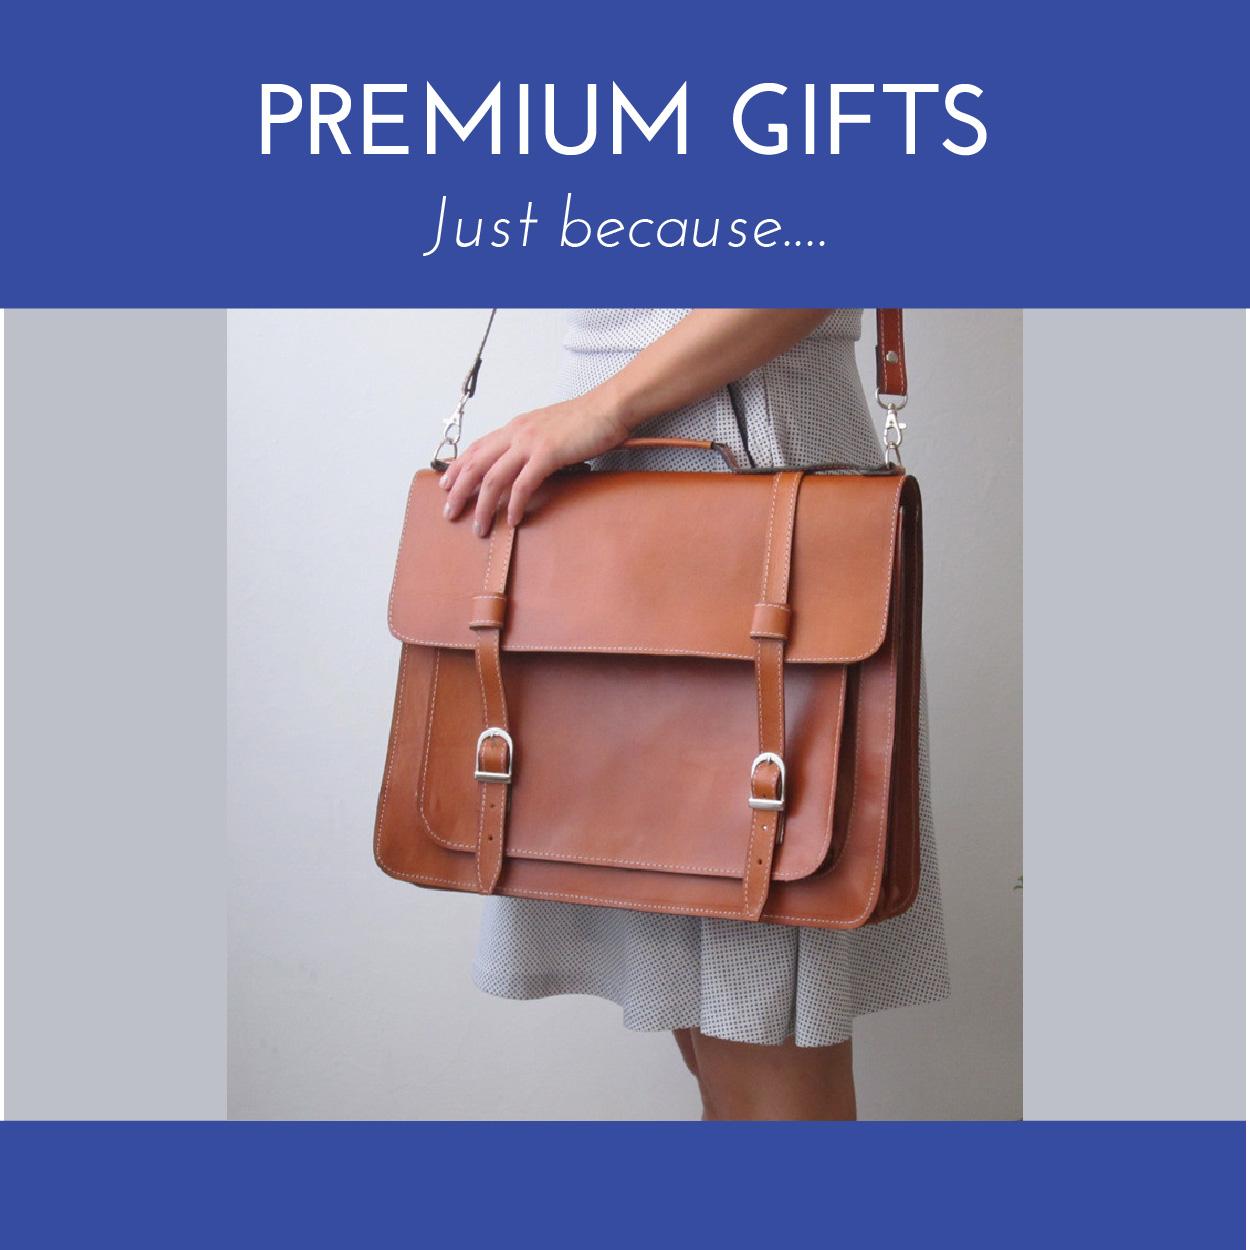 premium-gifts-01.jpg